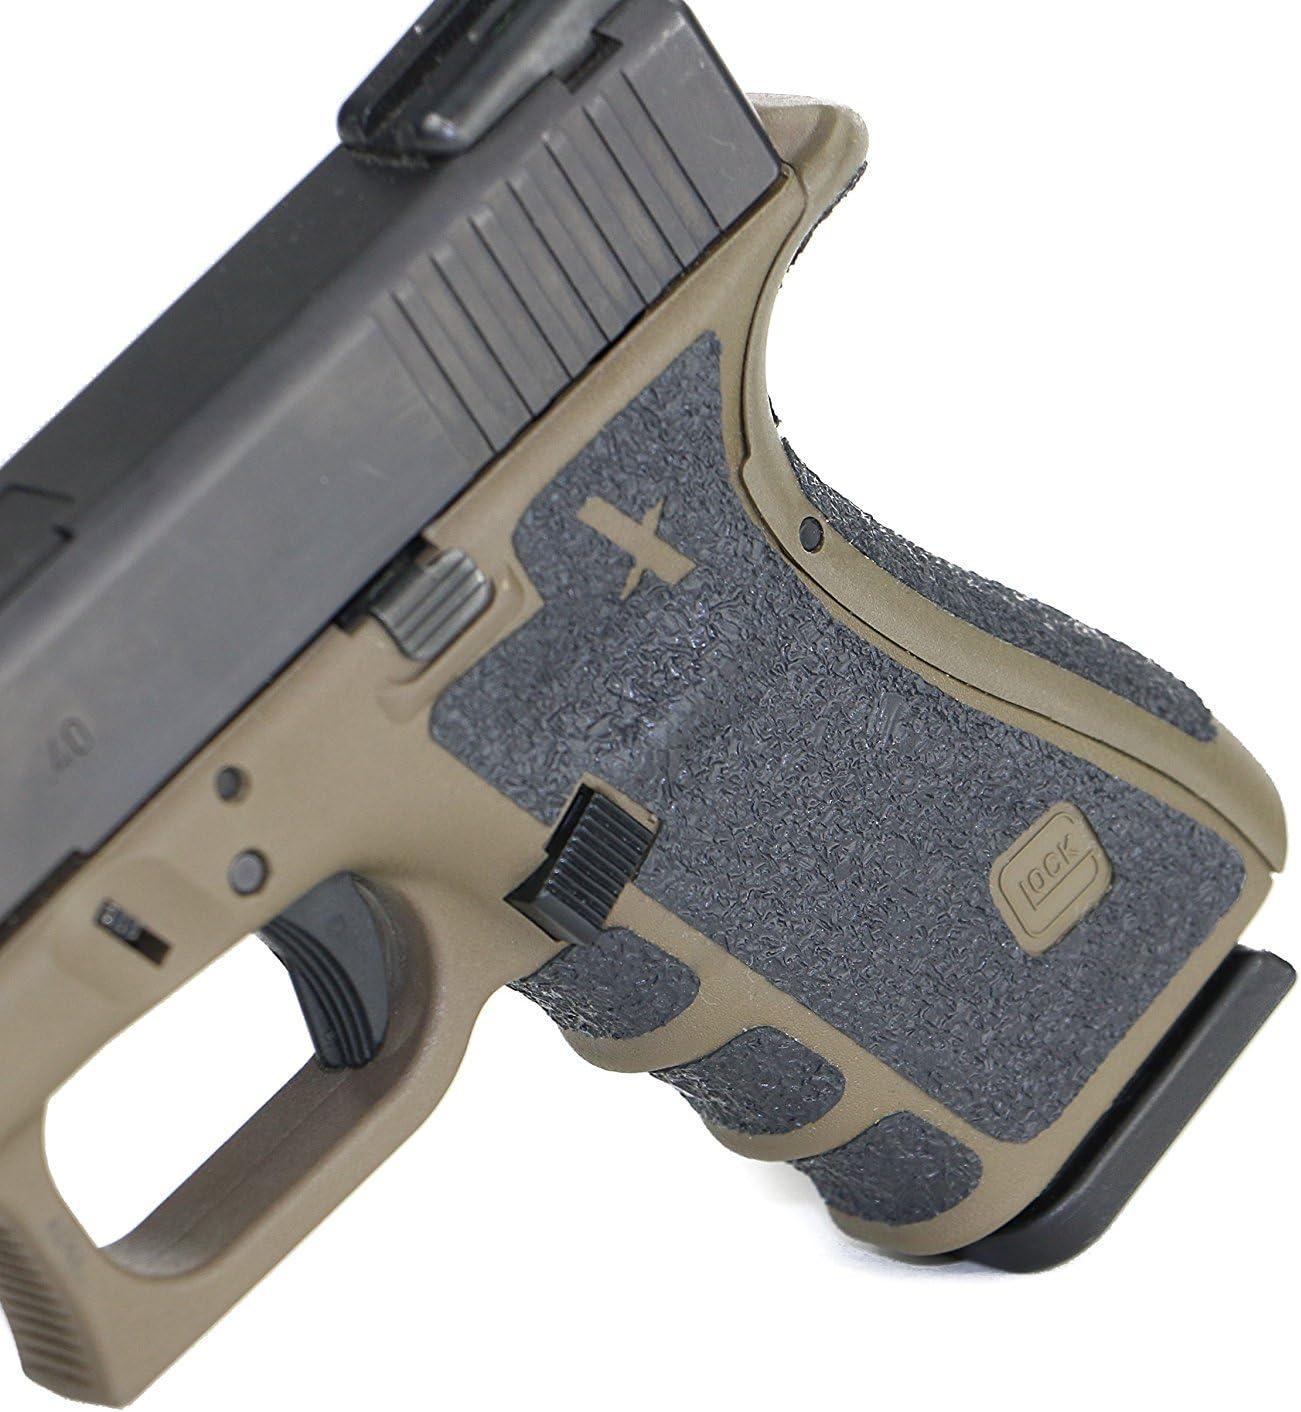 Foxx Grips San Jose Mall Super special price -Gun Compatible for Glock 34 3 31 17 24 22